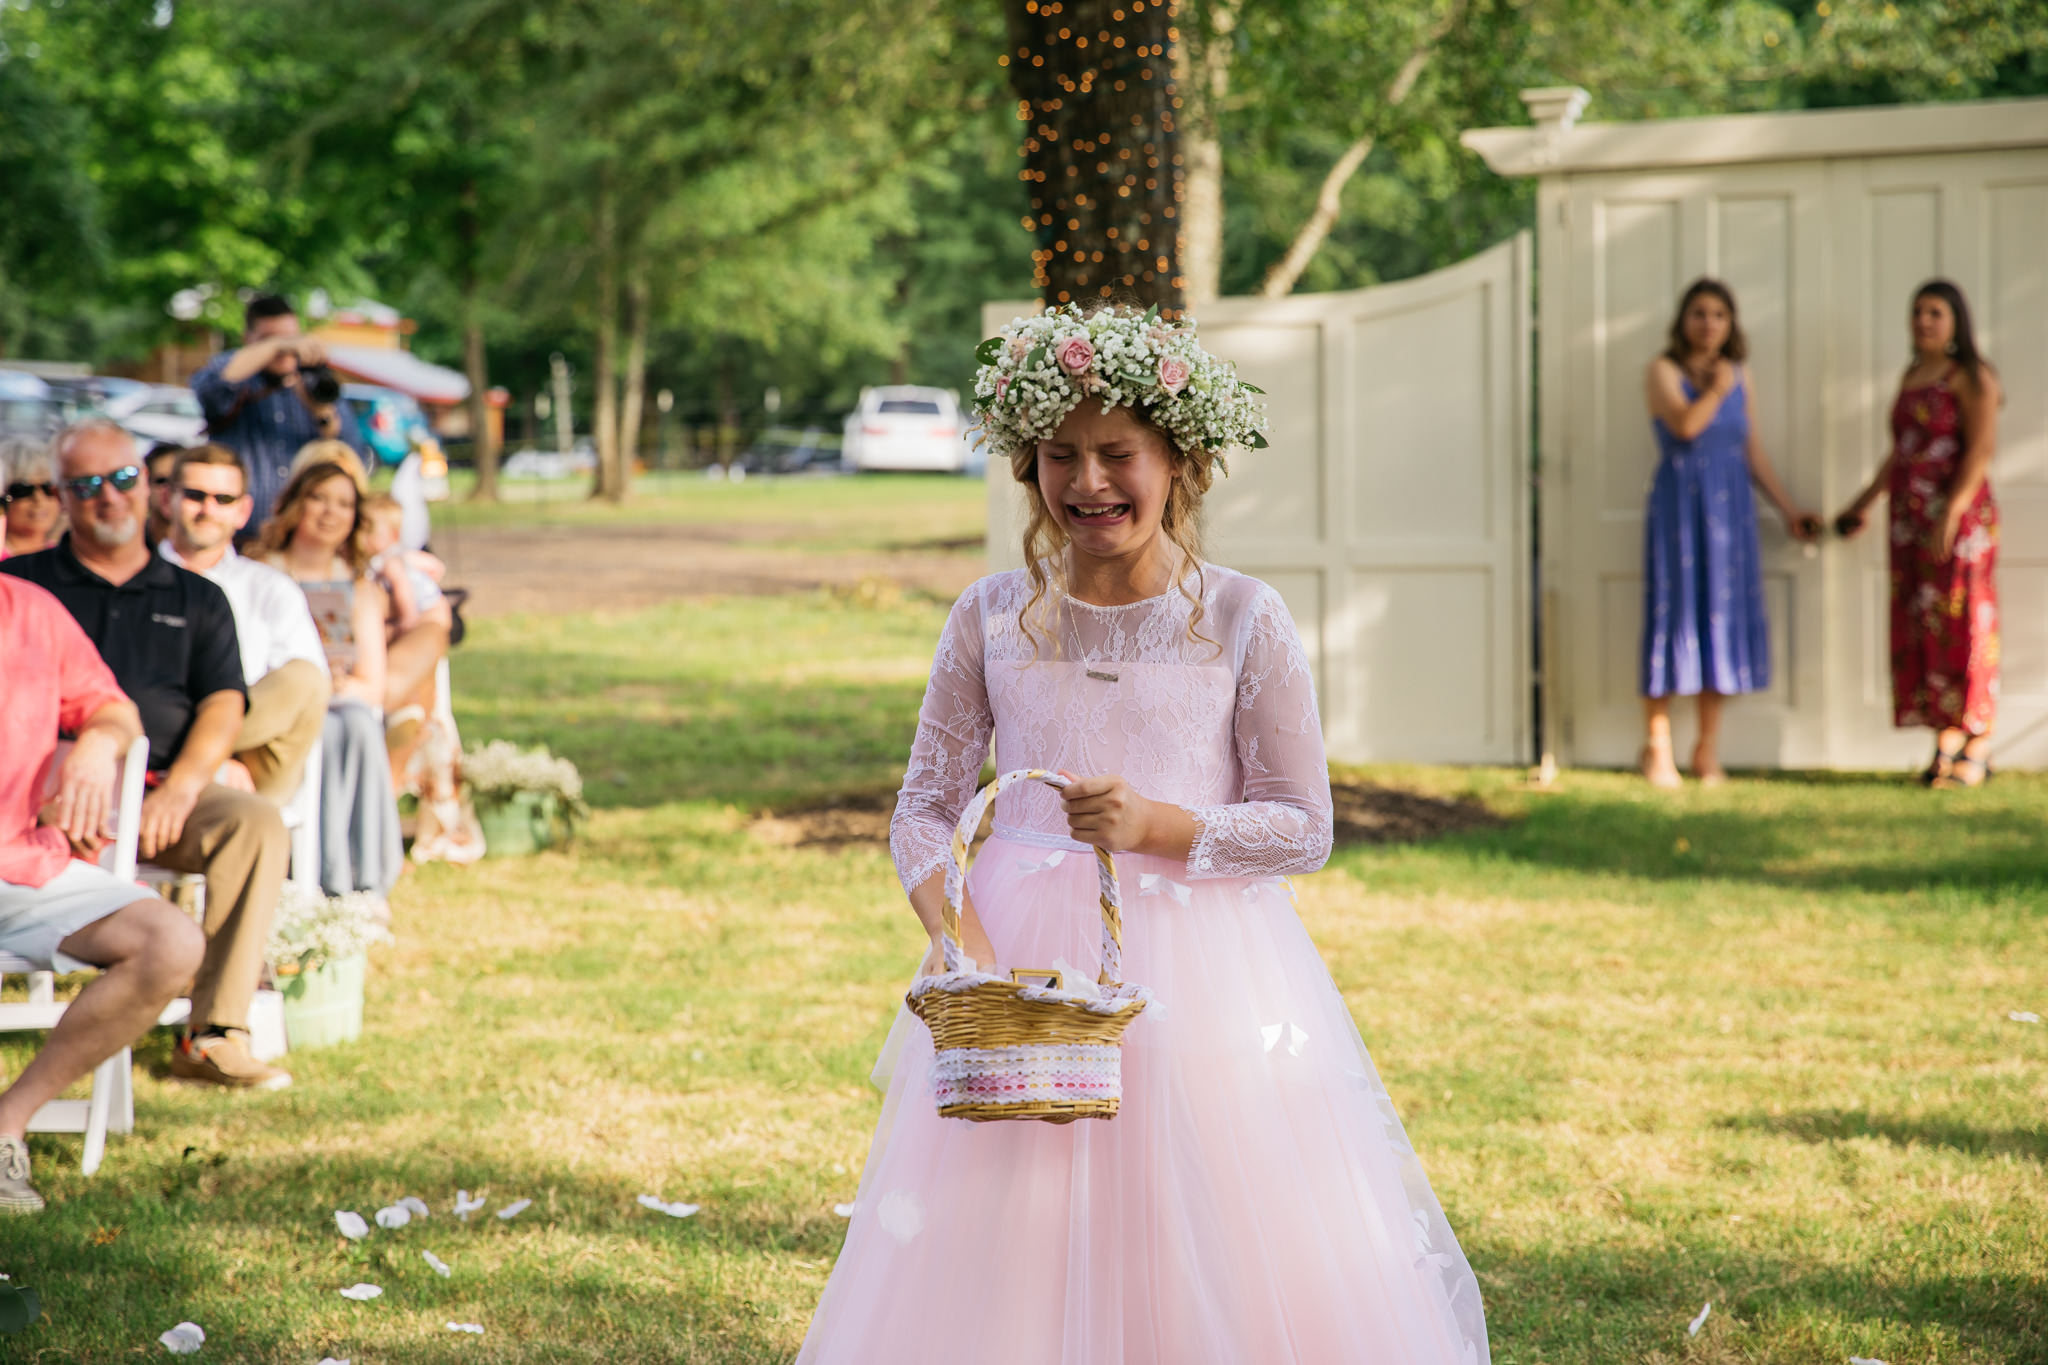 zbackyard-wedding-thewarmtharoundyou-lexy-branson-5.jpg